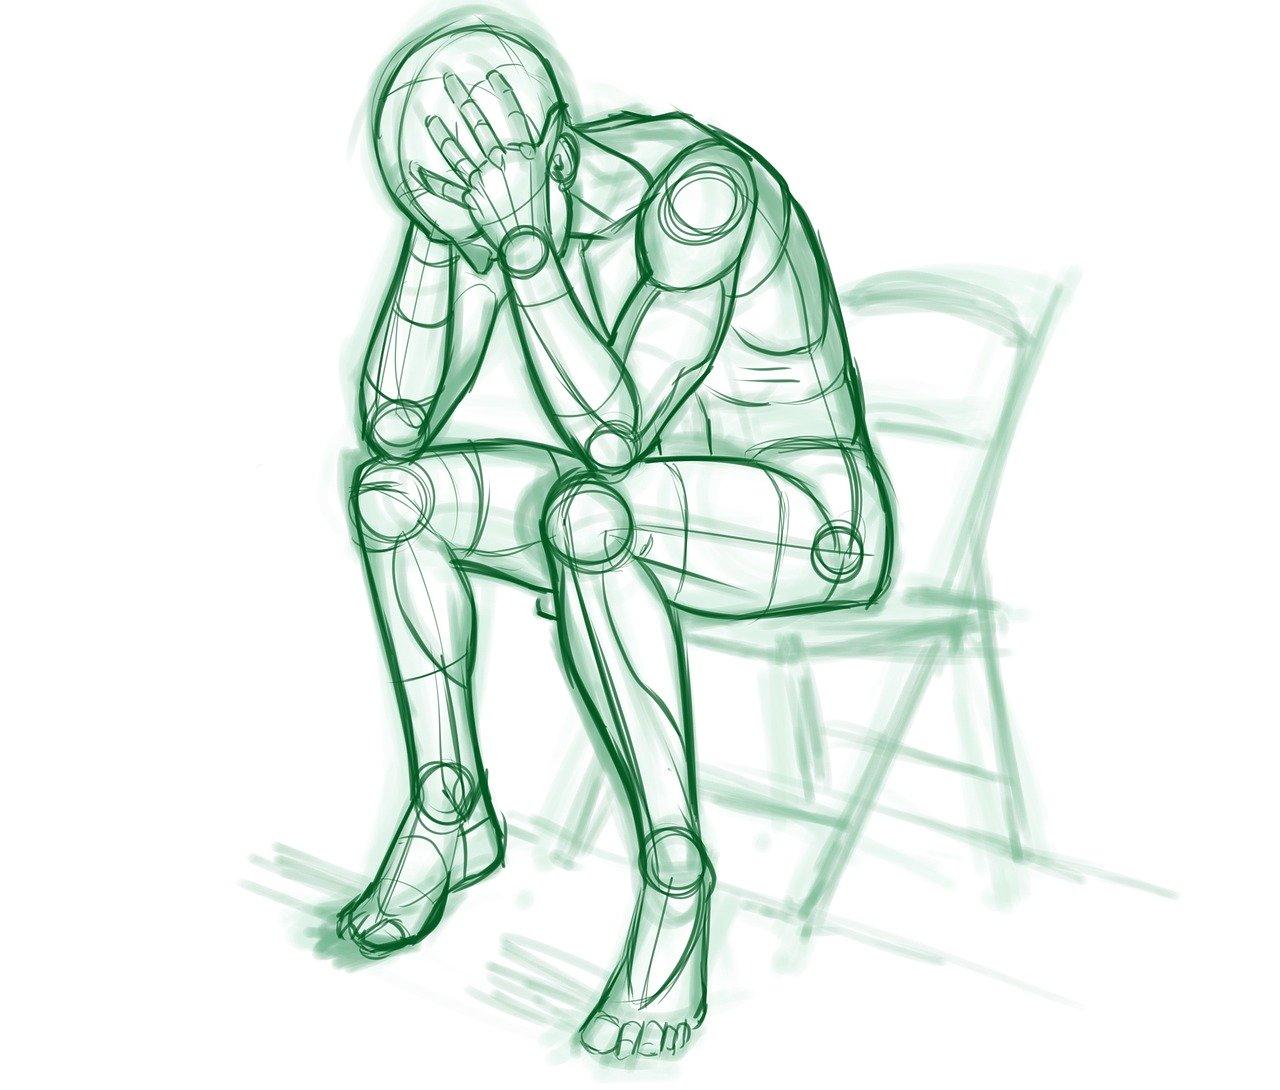 Session 8 – Sitting Disease